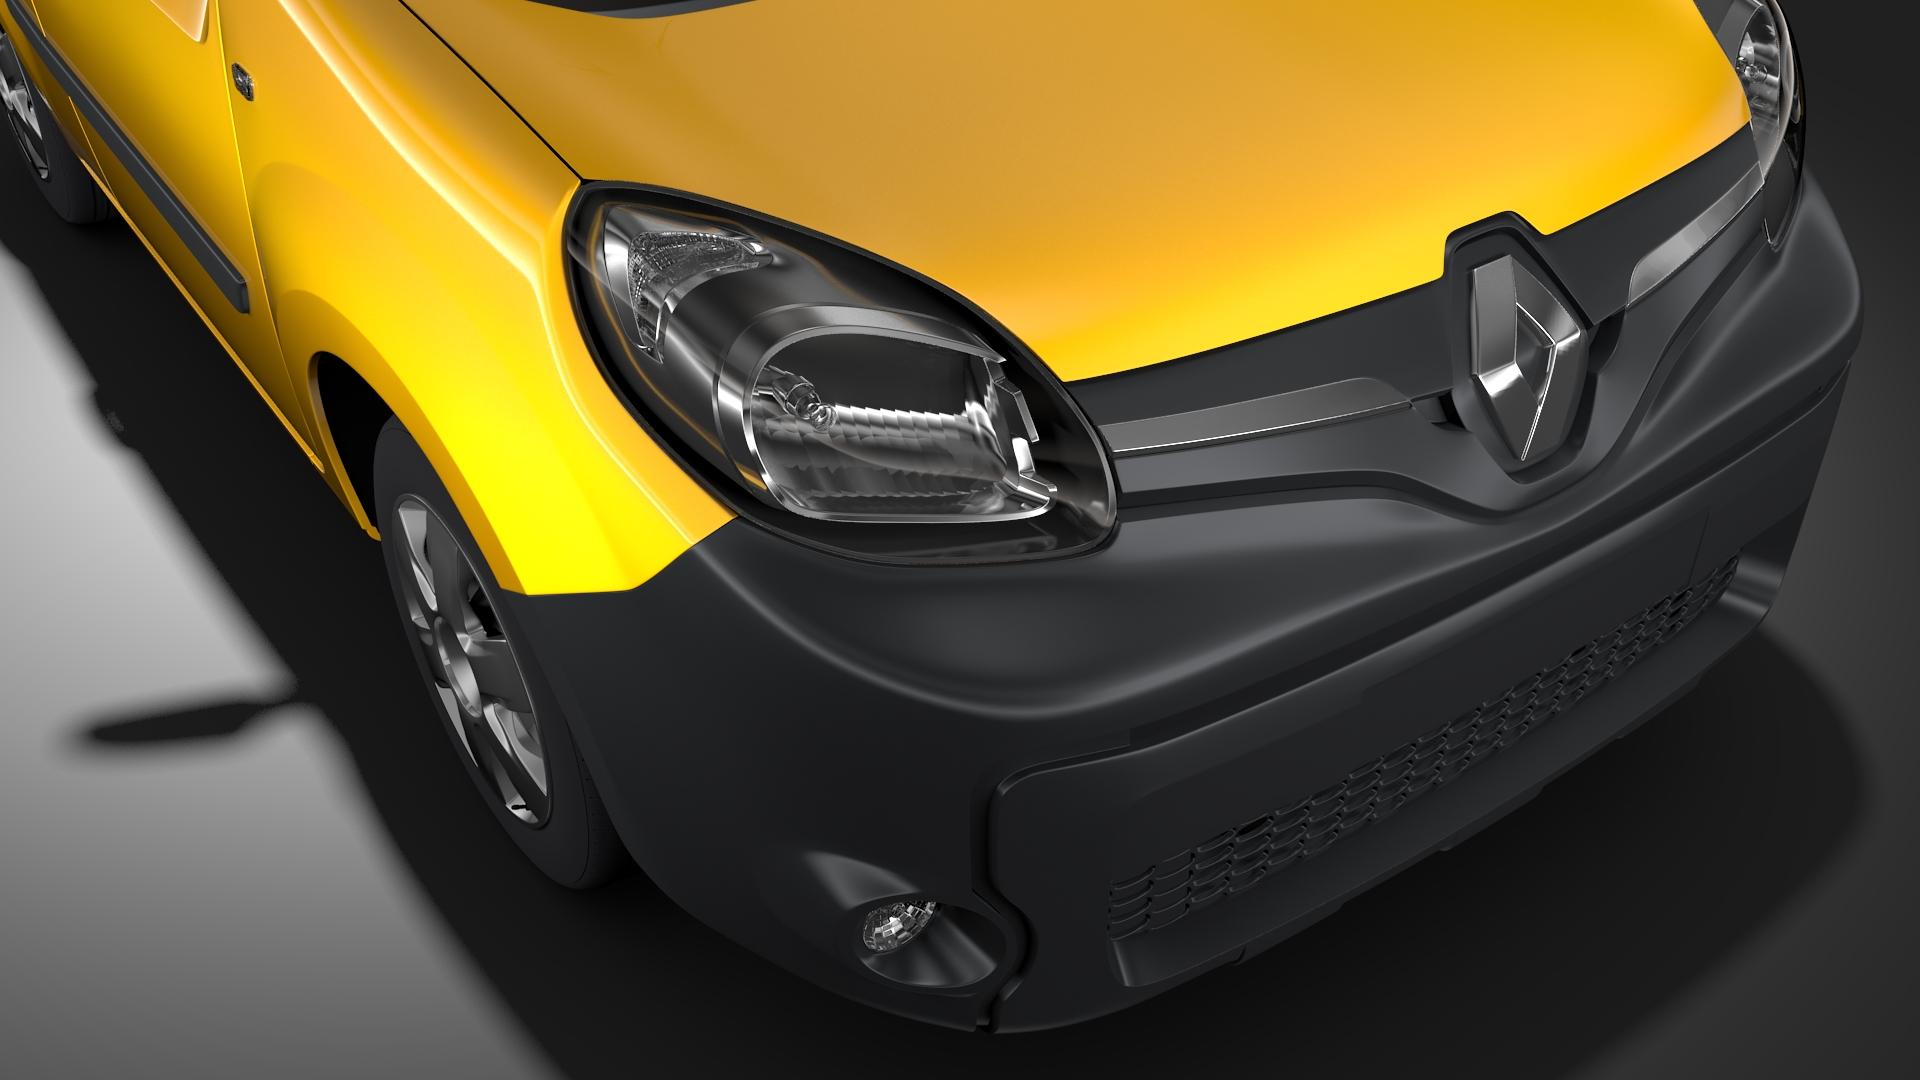 renault kangoo van 2017 l1 2017 3d modelis maks.